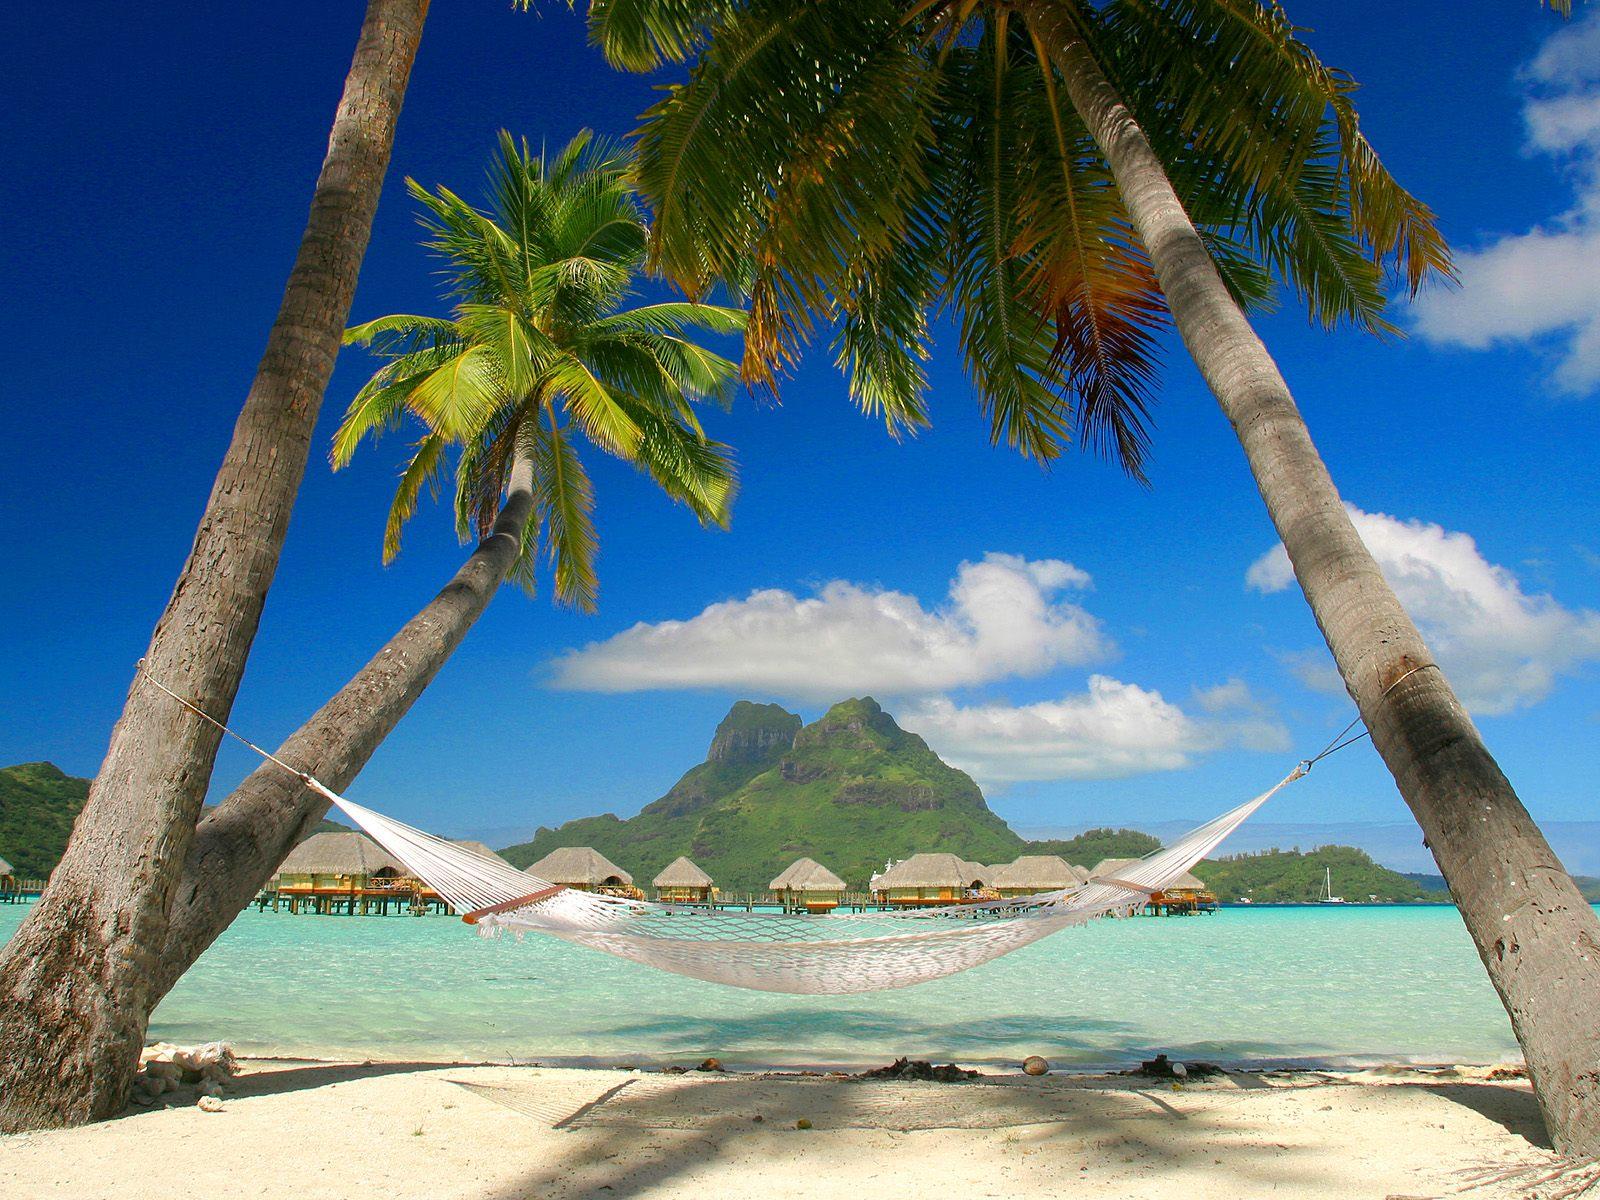 Tropical Beach Wallpaper 119, Free Wallpapers, Free Desktop Wallpapers ...